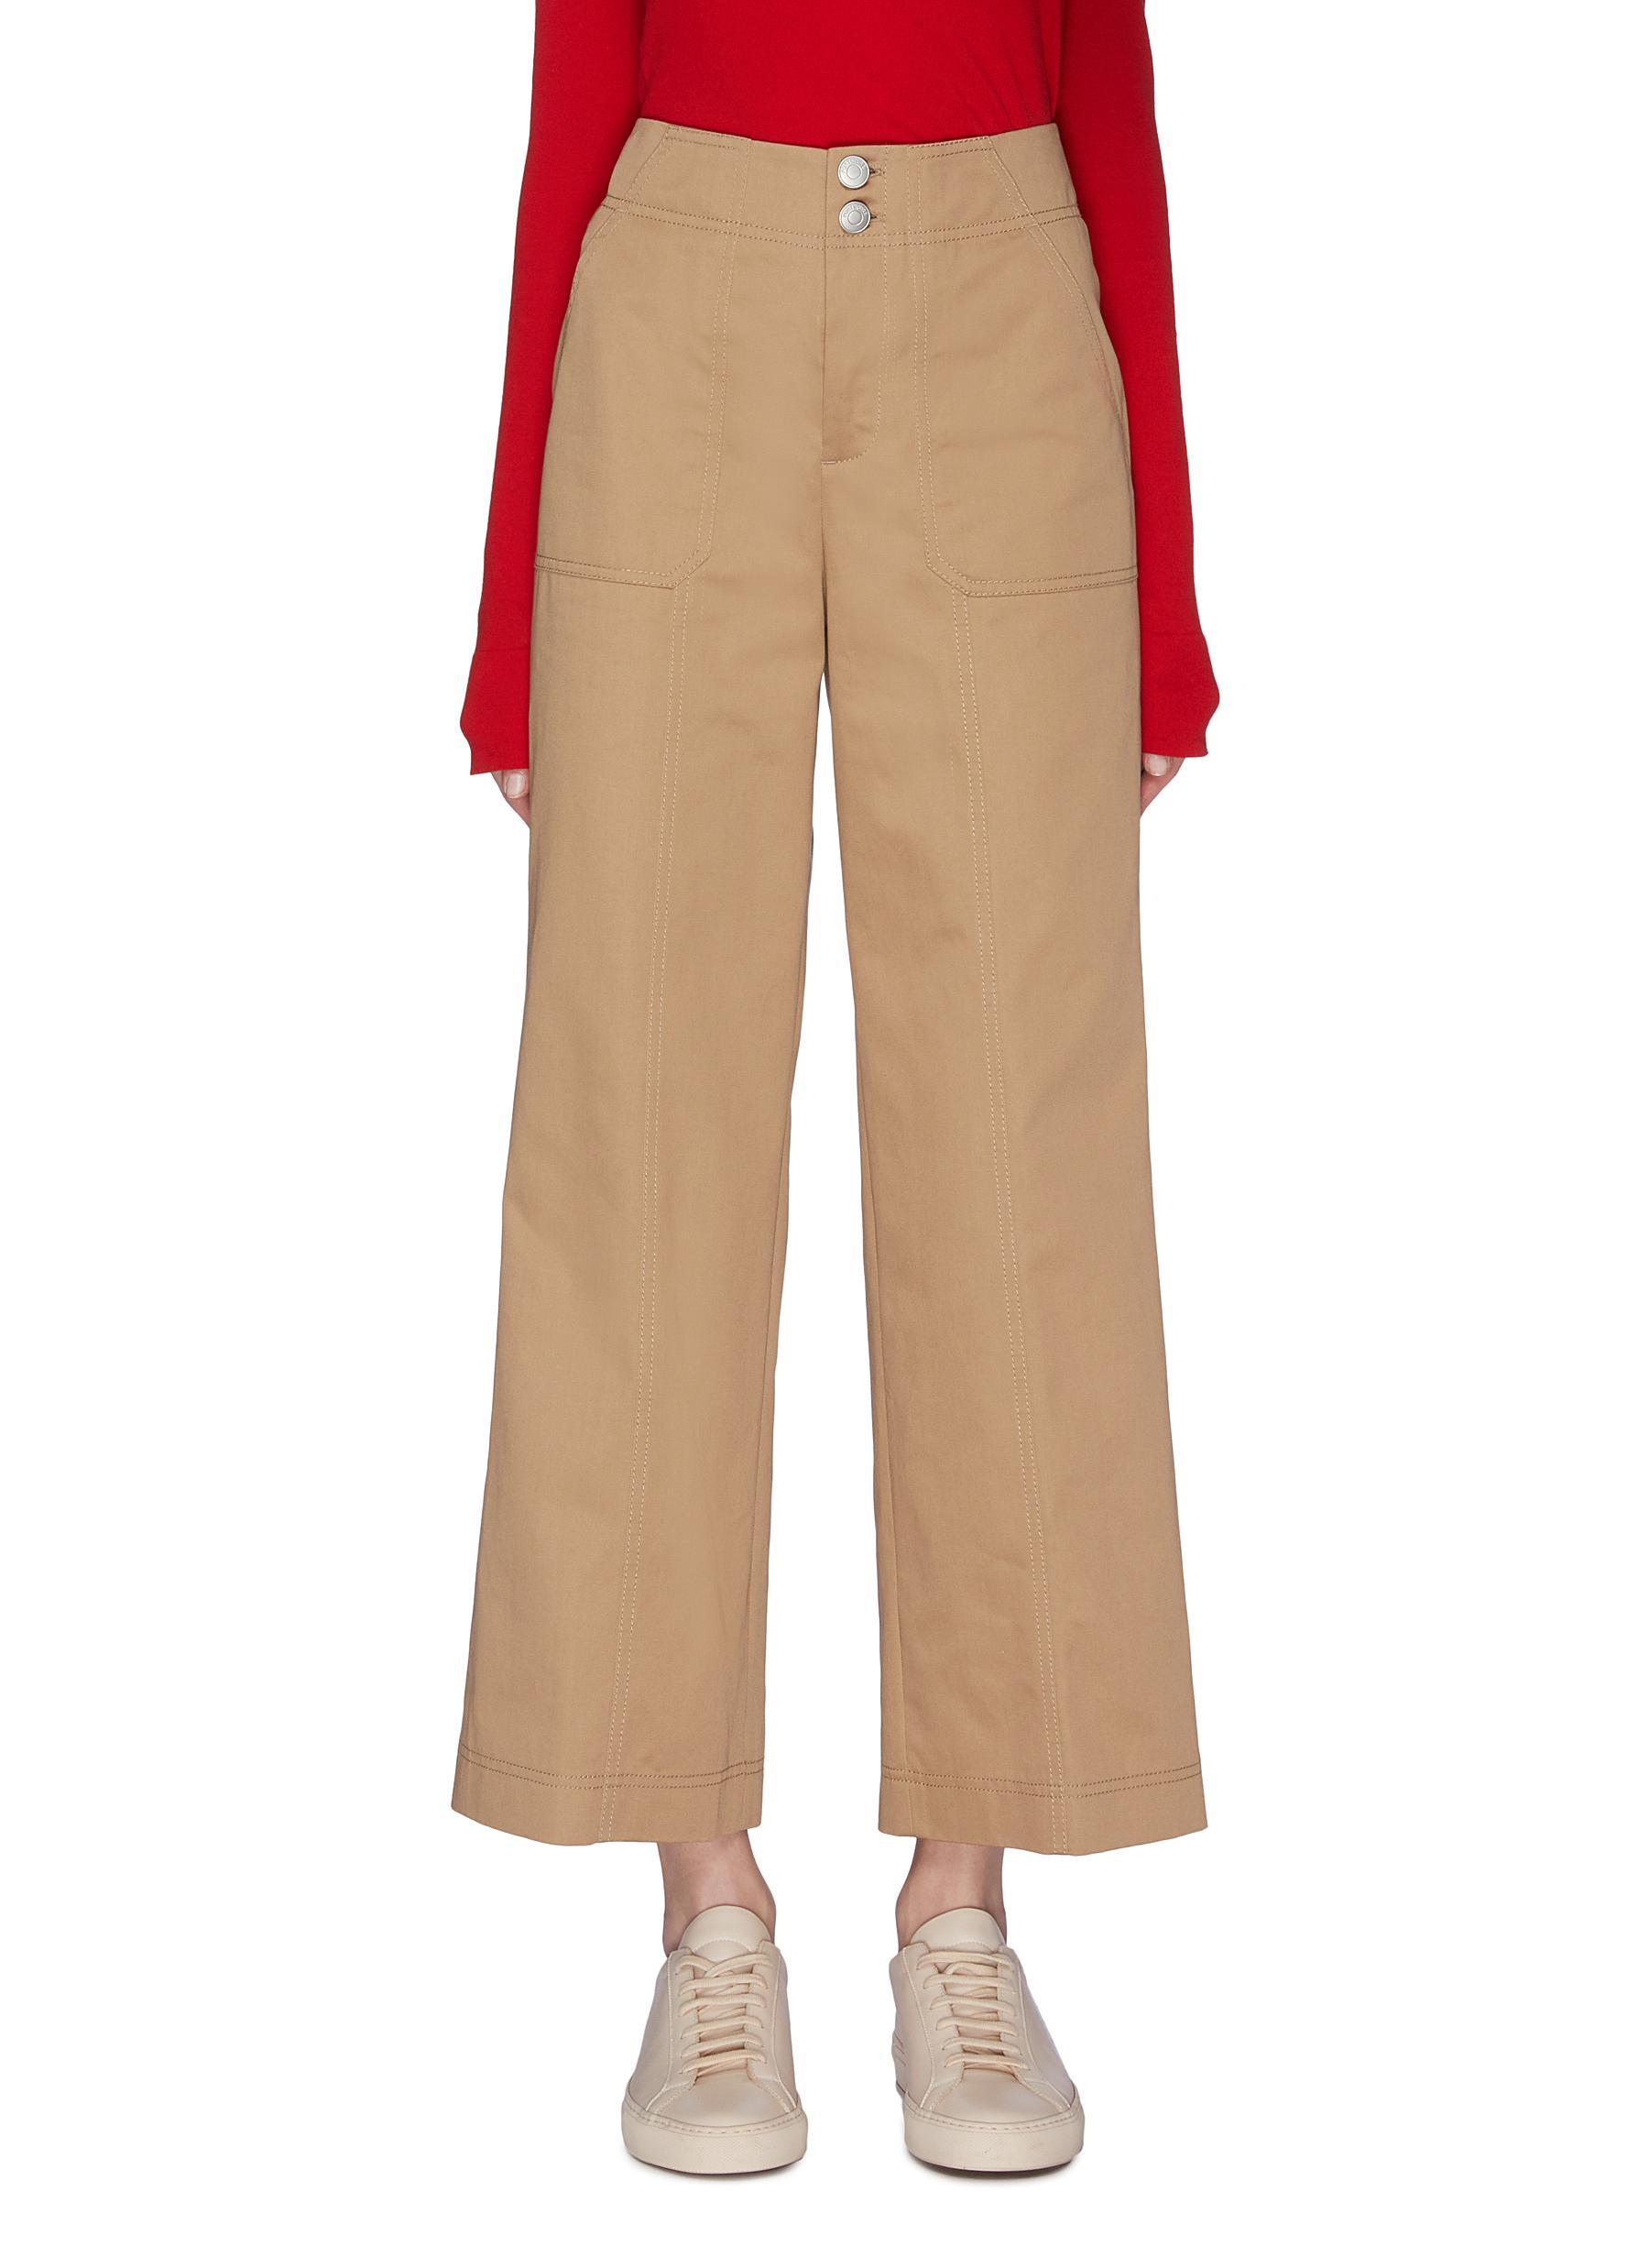 shop Portspure 'Utilitarian' contrast pocket drill pants online